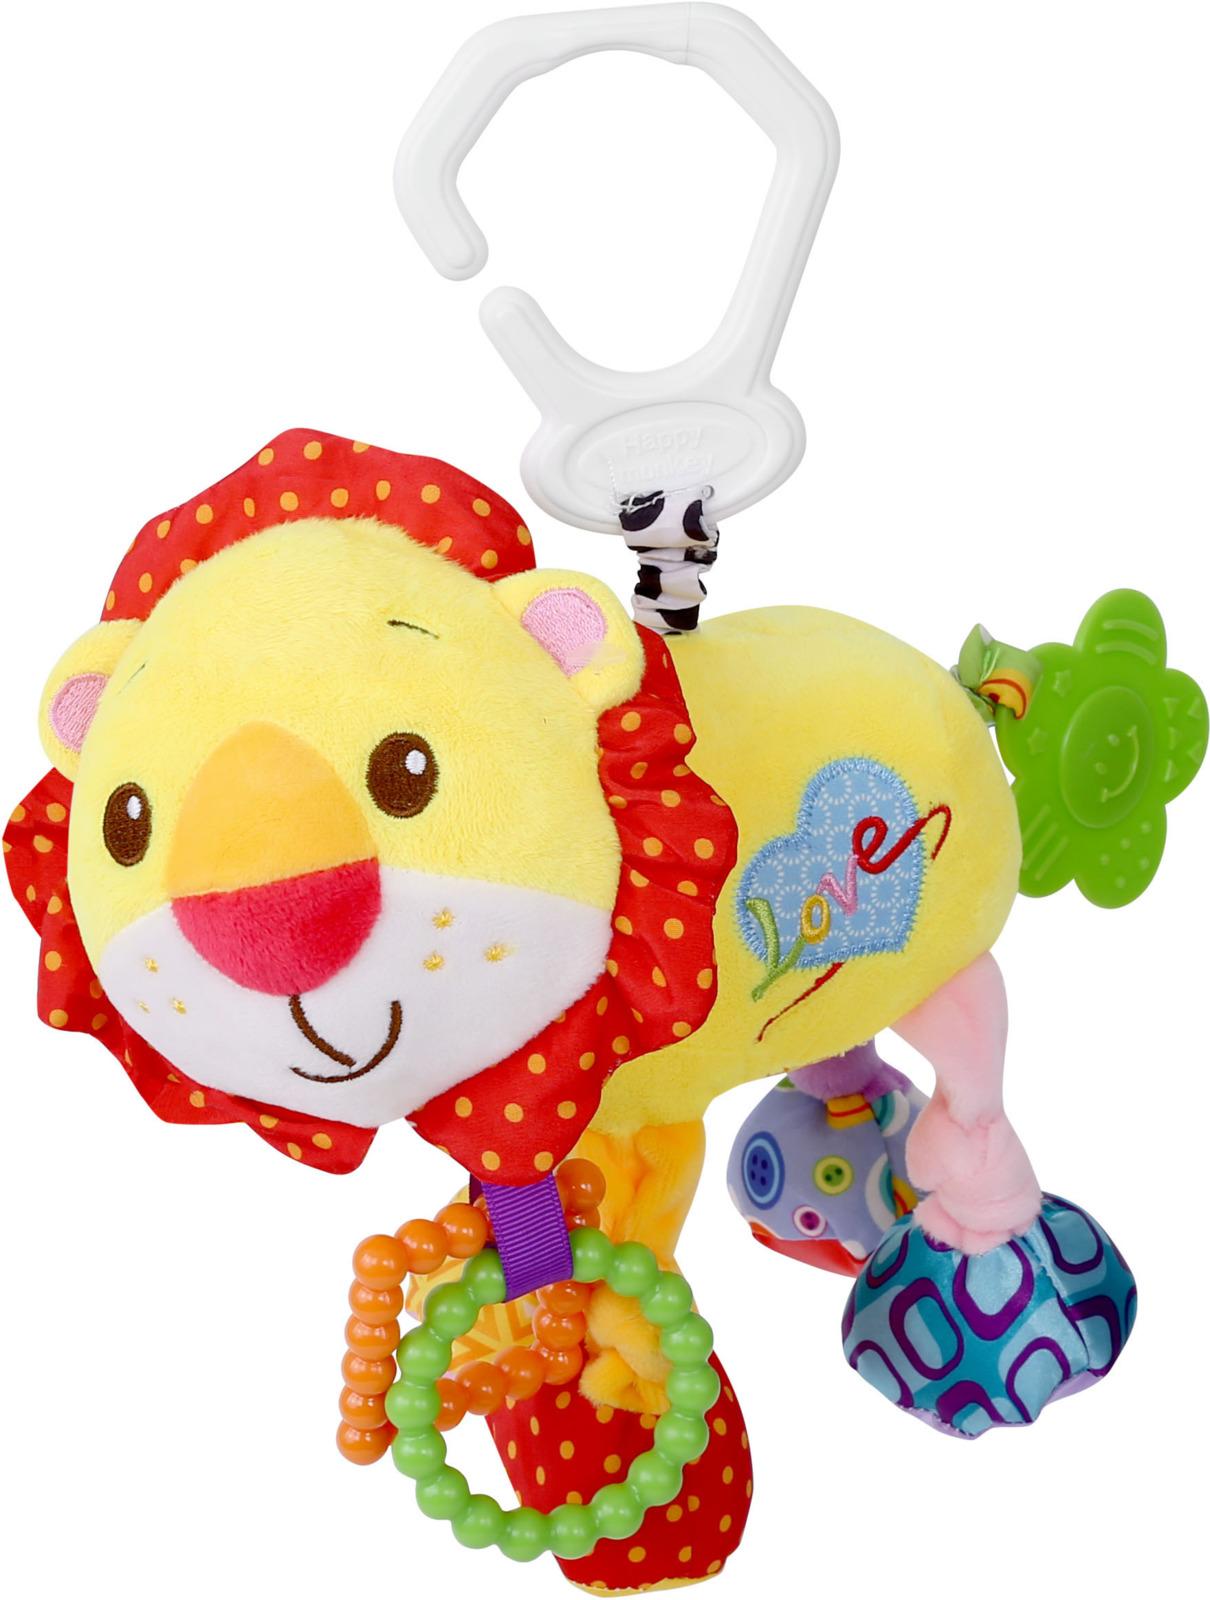 Развивающая игрушка Lorelli Toys Лев. 1019116 развивающая игрушка lorelli toys обними меня мартышка 10191260001